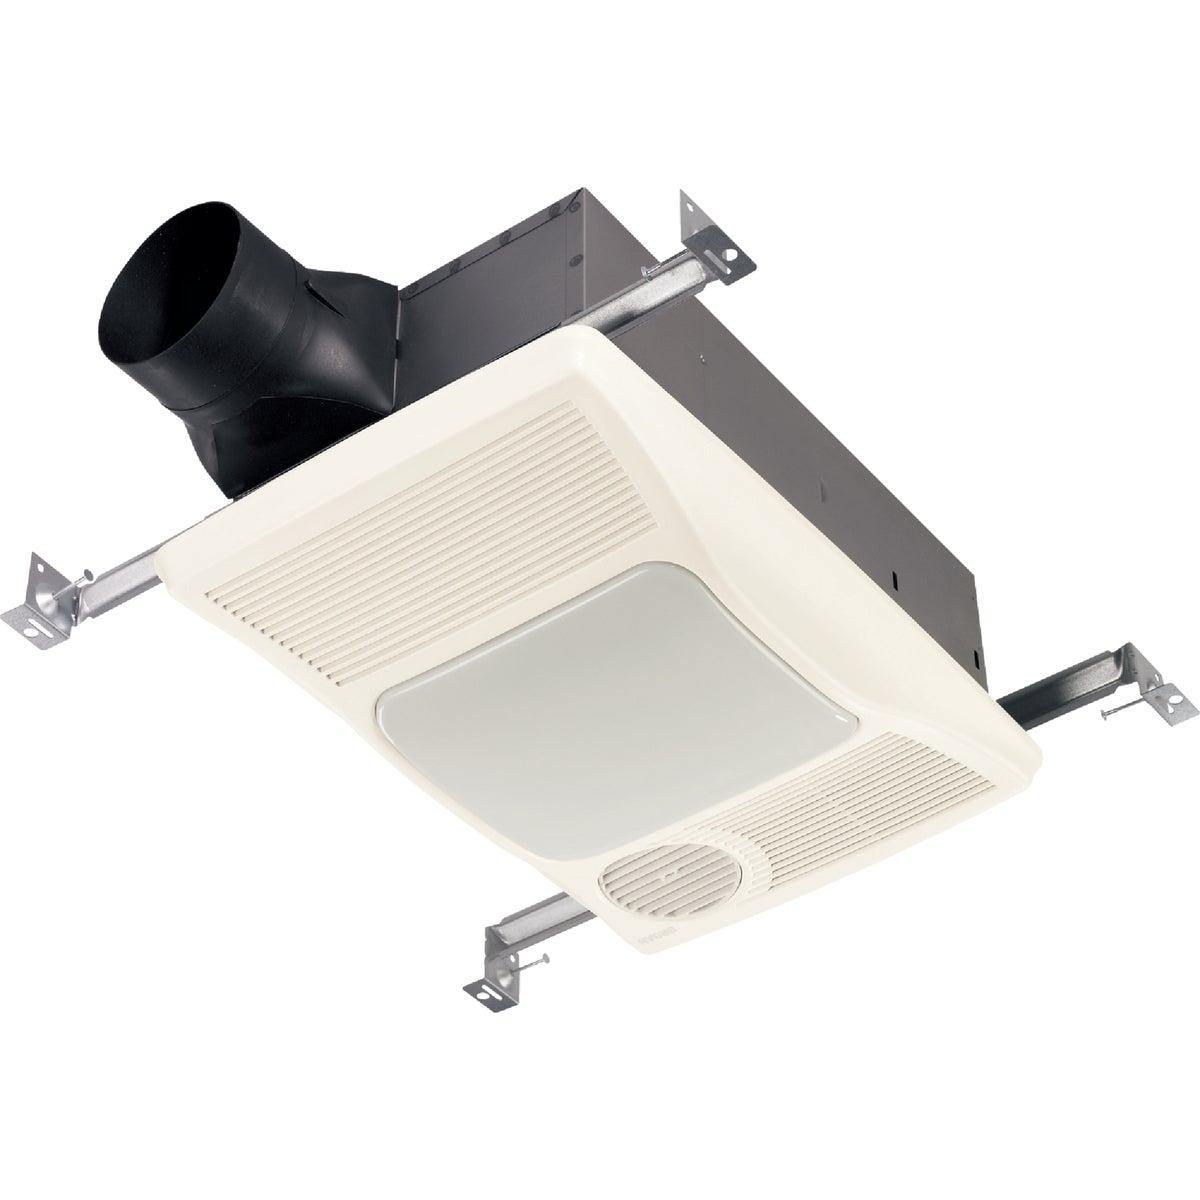 100 CFM Incandescent Light/Directional Heater Bath Exhaust Fan, 100HL